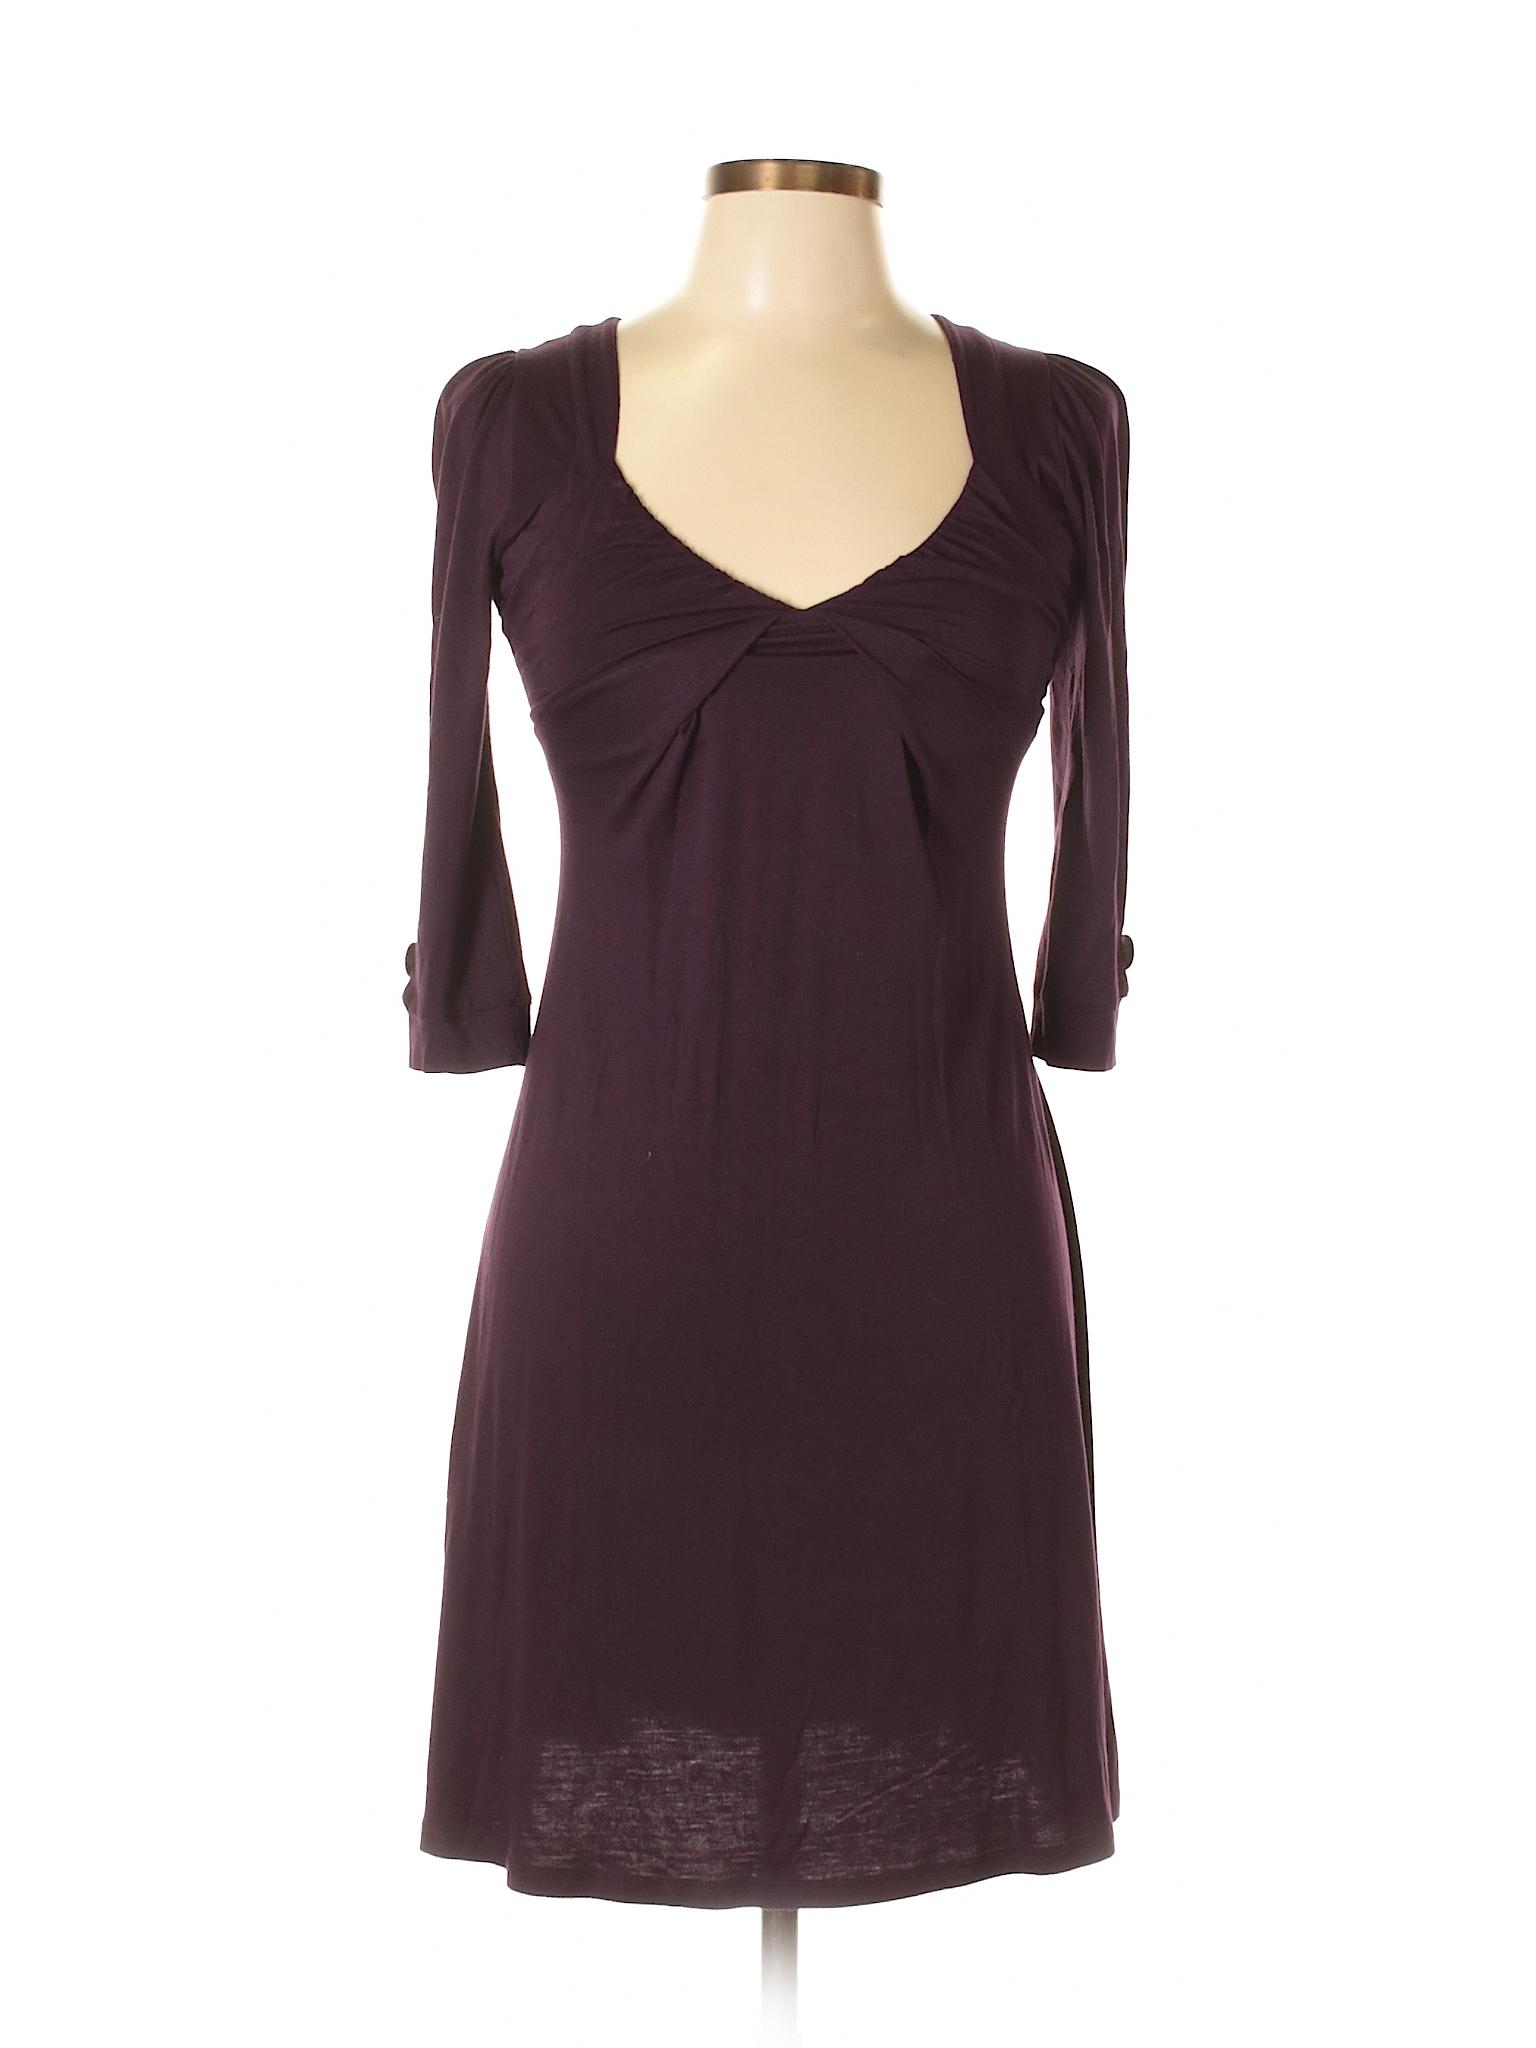 Selling Casual Zara Basic Basic Zara Dress Casual Selling Selling Zara Dress UtqUzrw0x